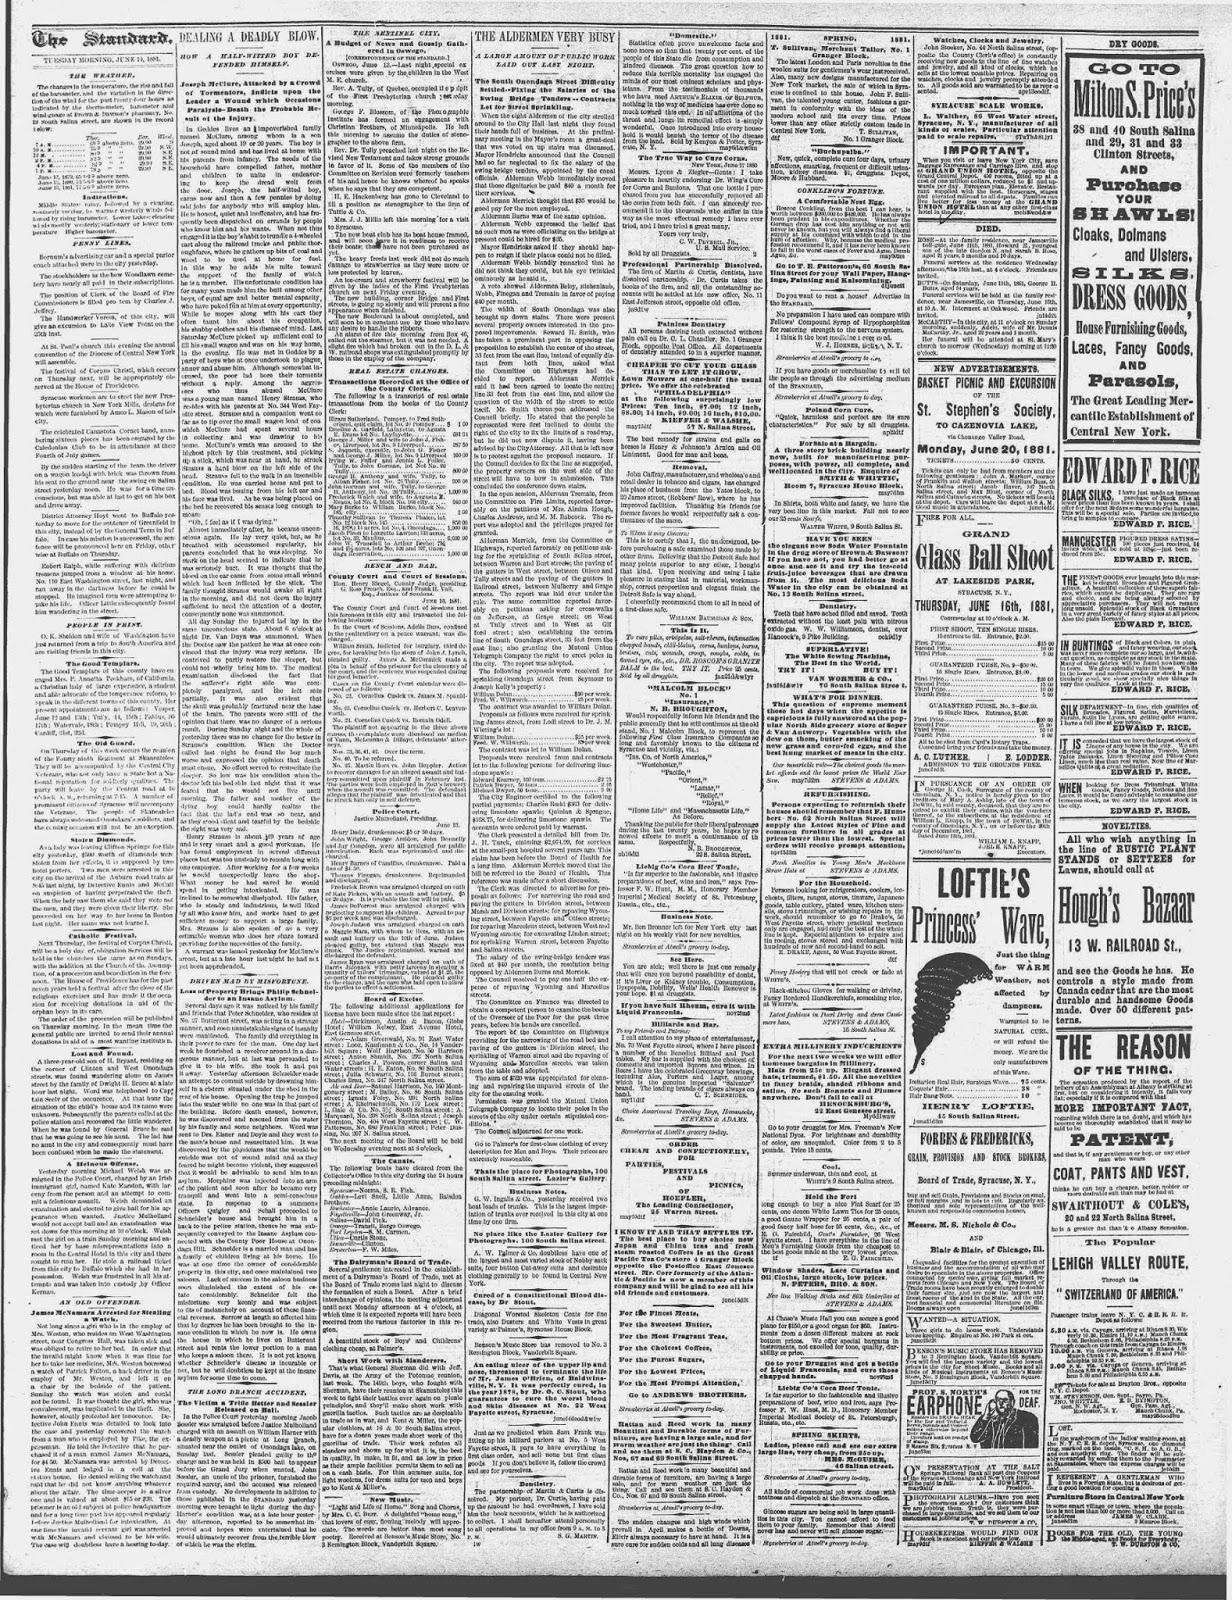 Climbing My Family Tree:  Strauss-McClure fight The Syracuse Standard, June 14, 1881